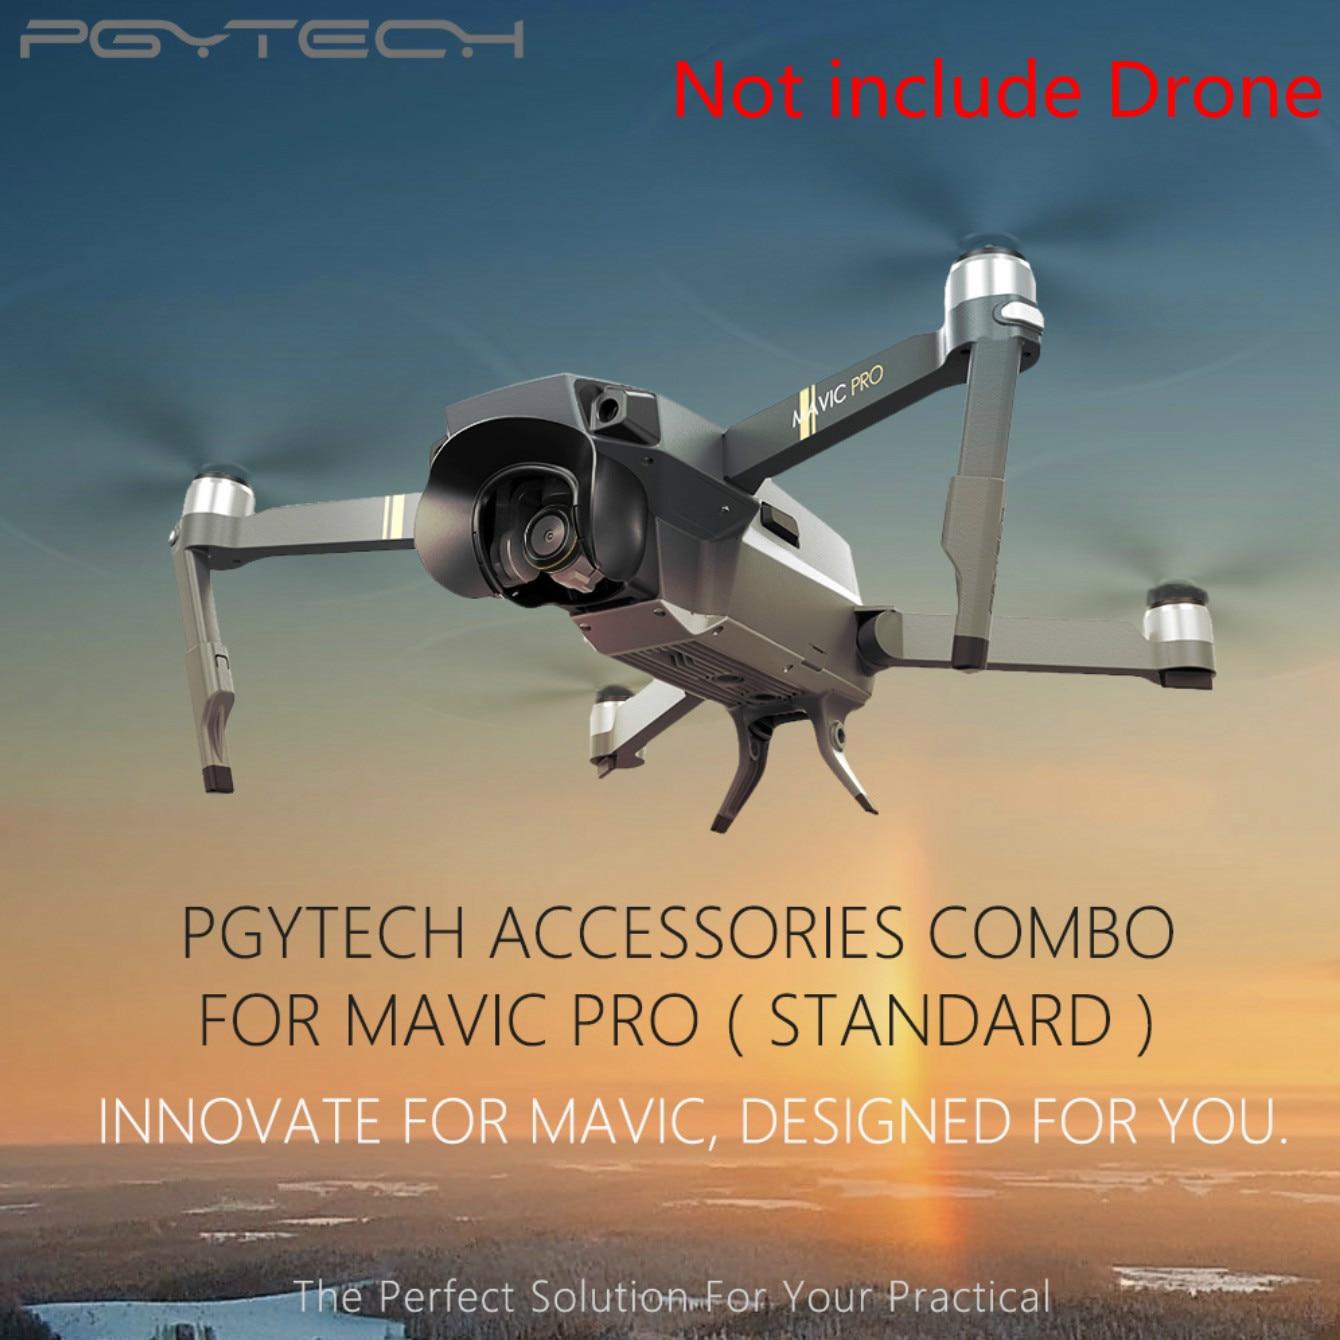 Standaard Mavic Pro Accessoires Combo Landing Pad Zonnekap Propeller Houder Landingsgestel Drone Accessoire Voor Dji Mavic Pro Combo Hot Sale 50-70% Korting